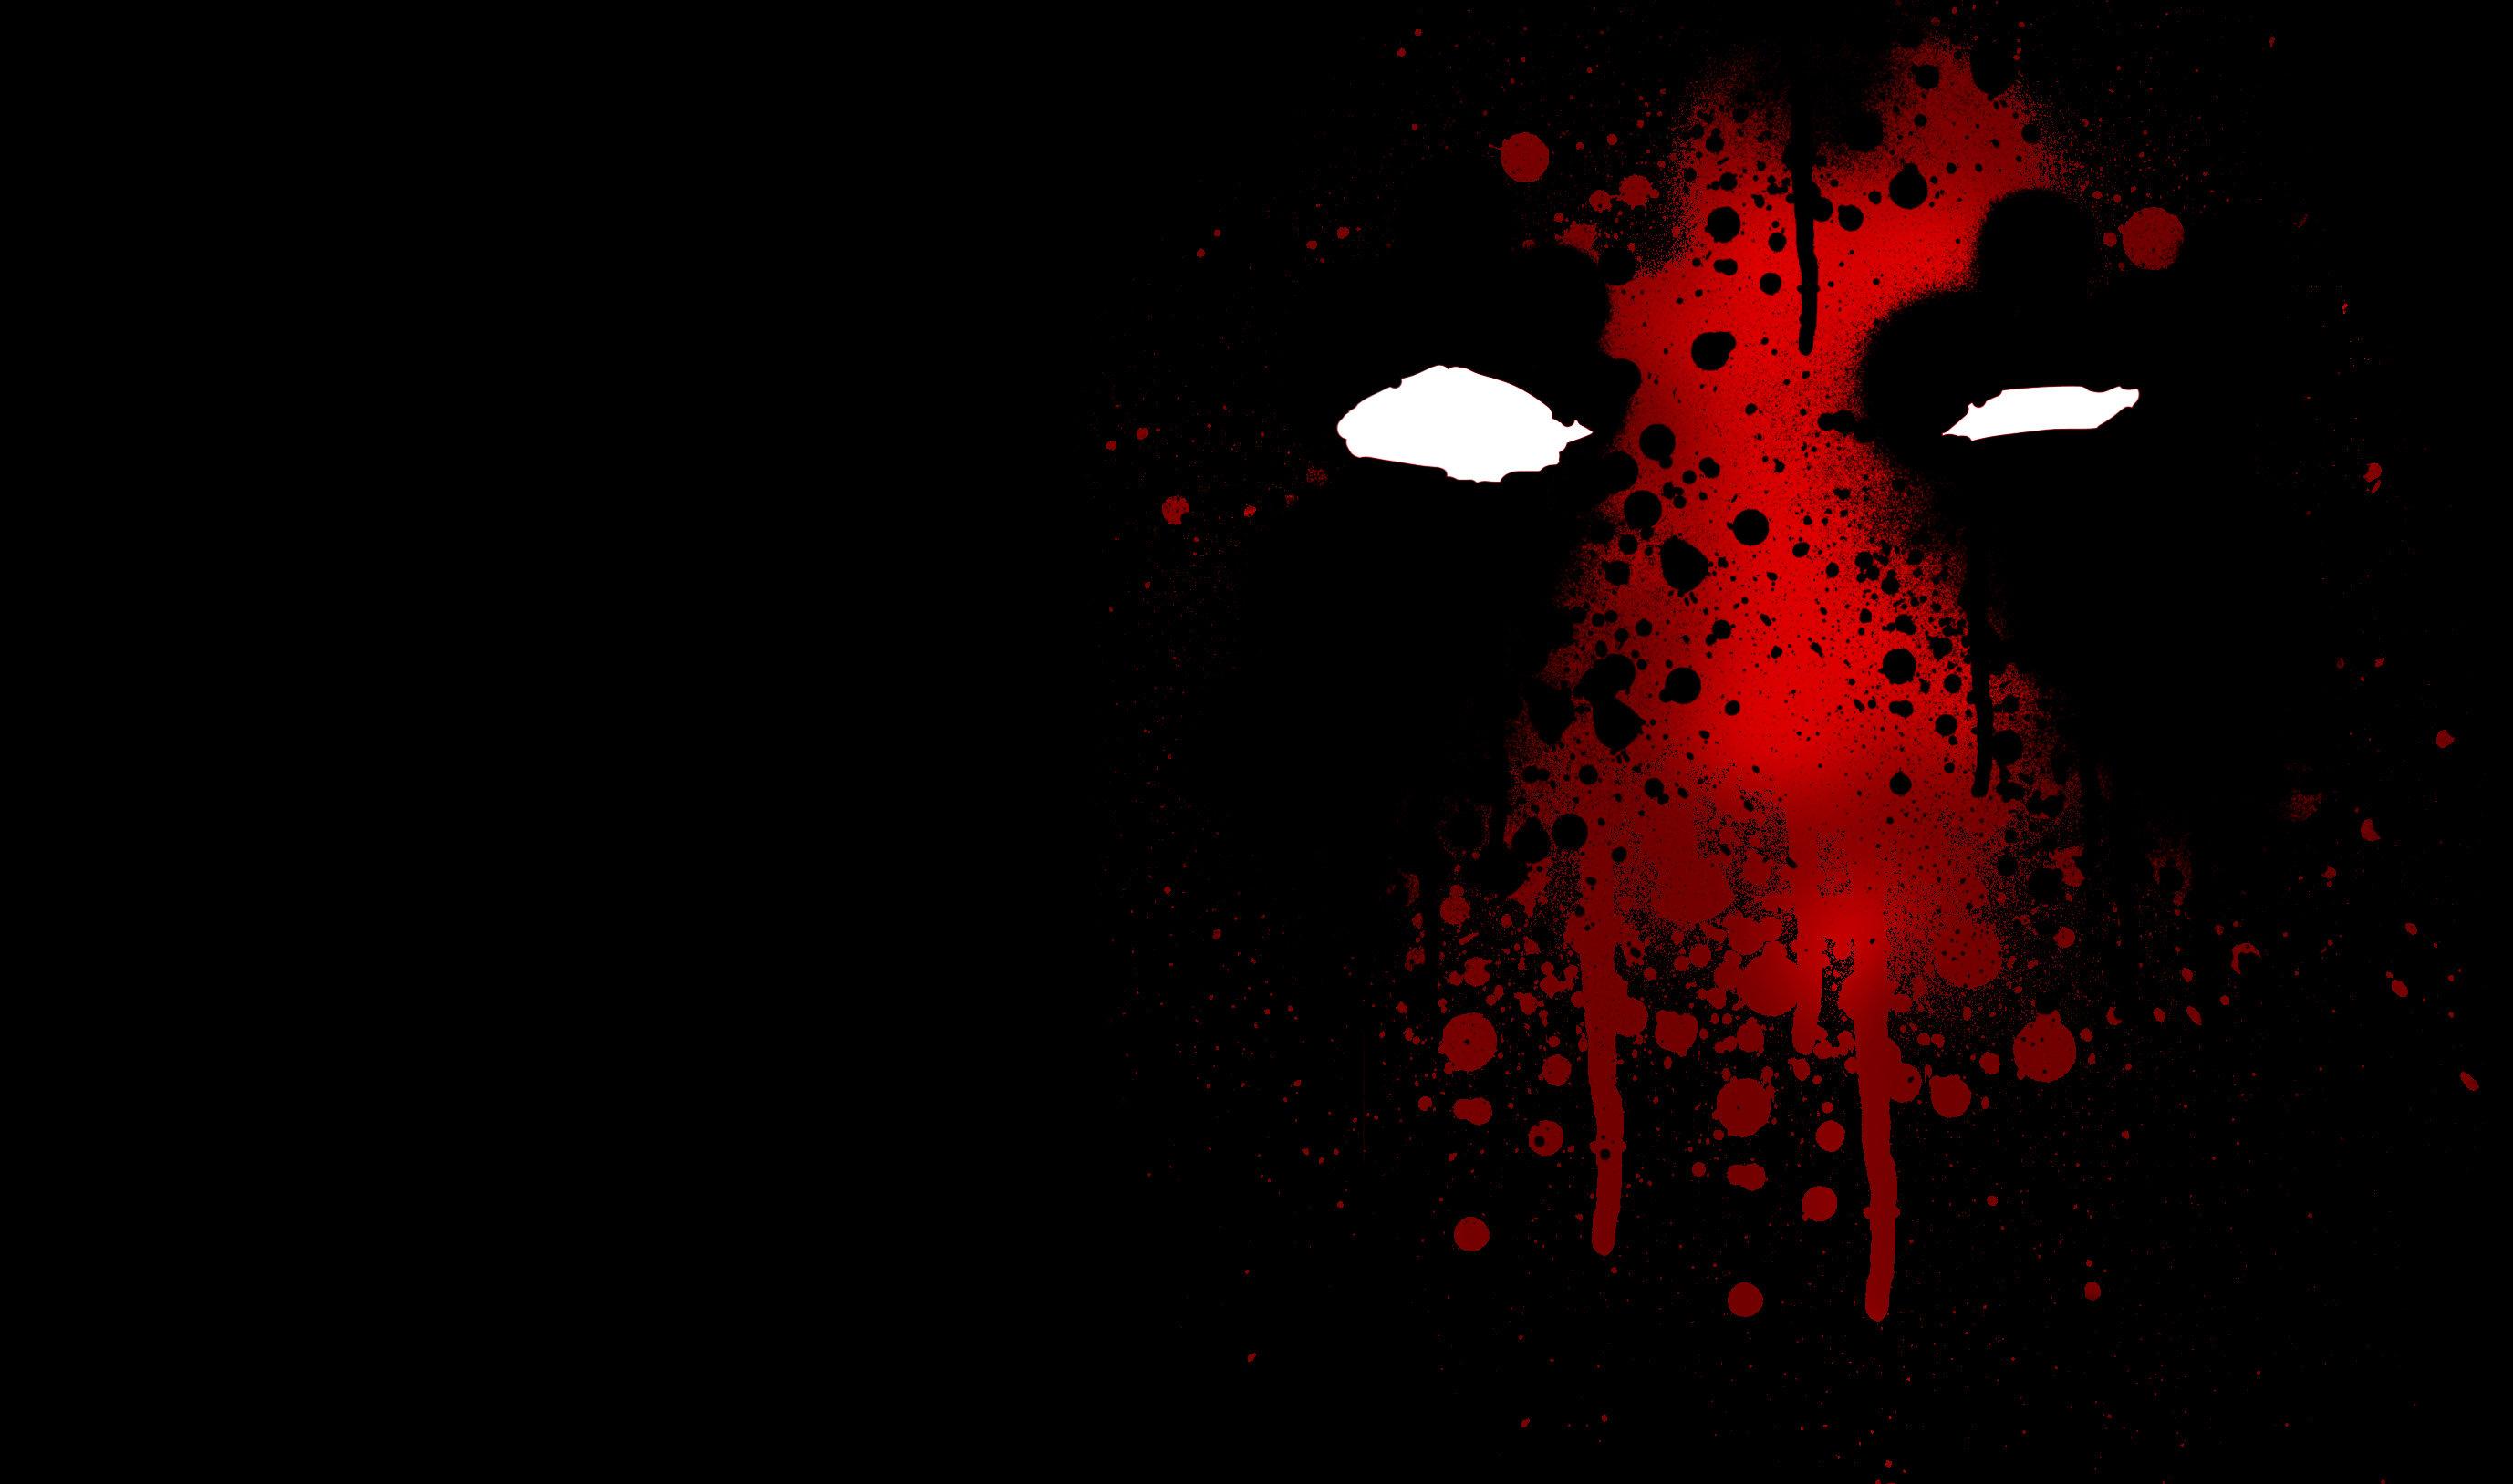 Deadpool Wallpapers - CityLoveHZ.com